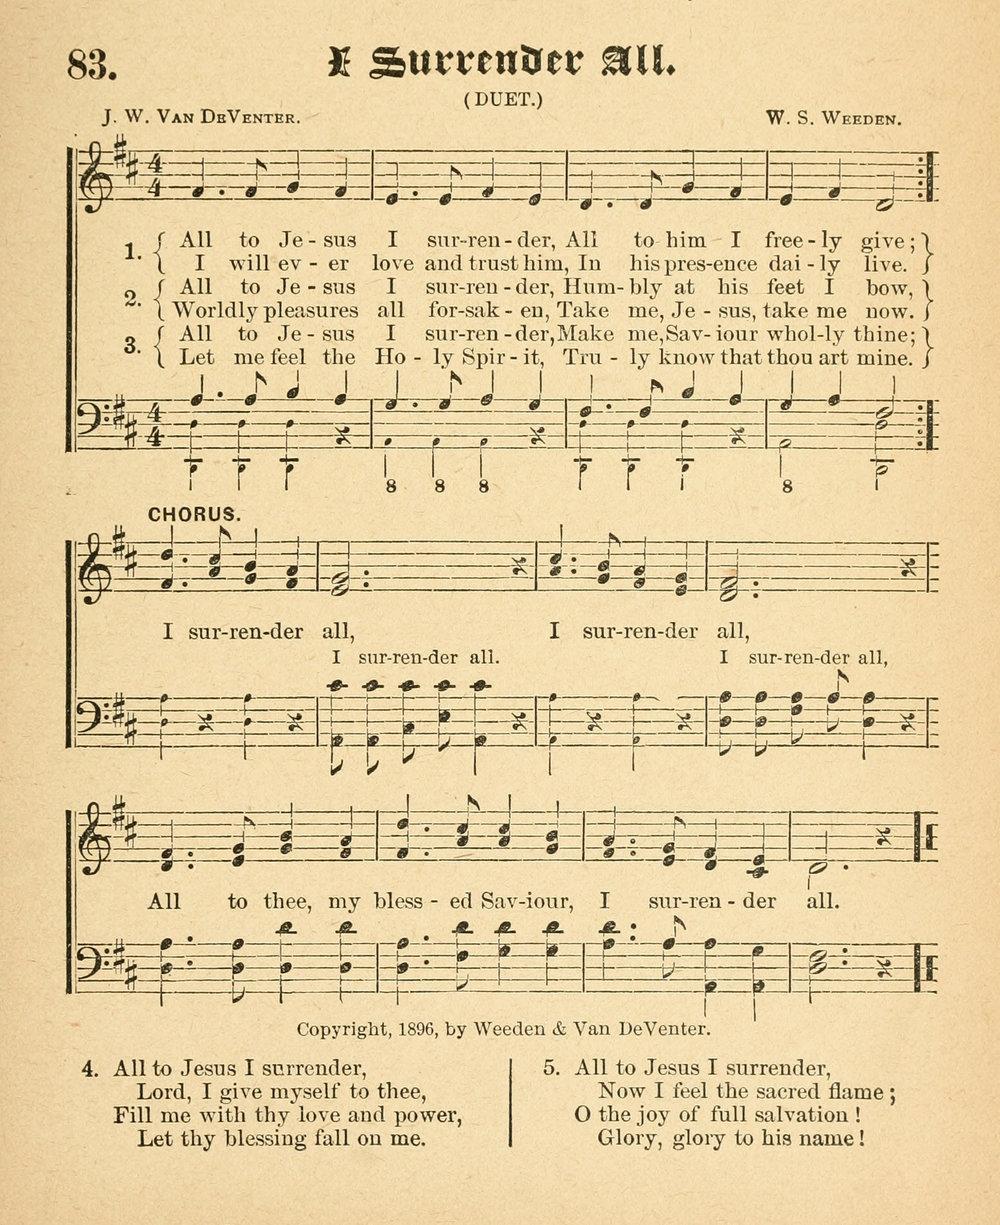 Fig. 1.   Gospel Songs of Grace and Glory  (NY: Sebring Publishing, 1896).